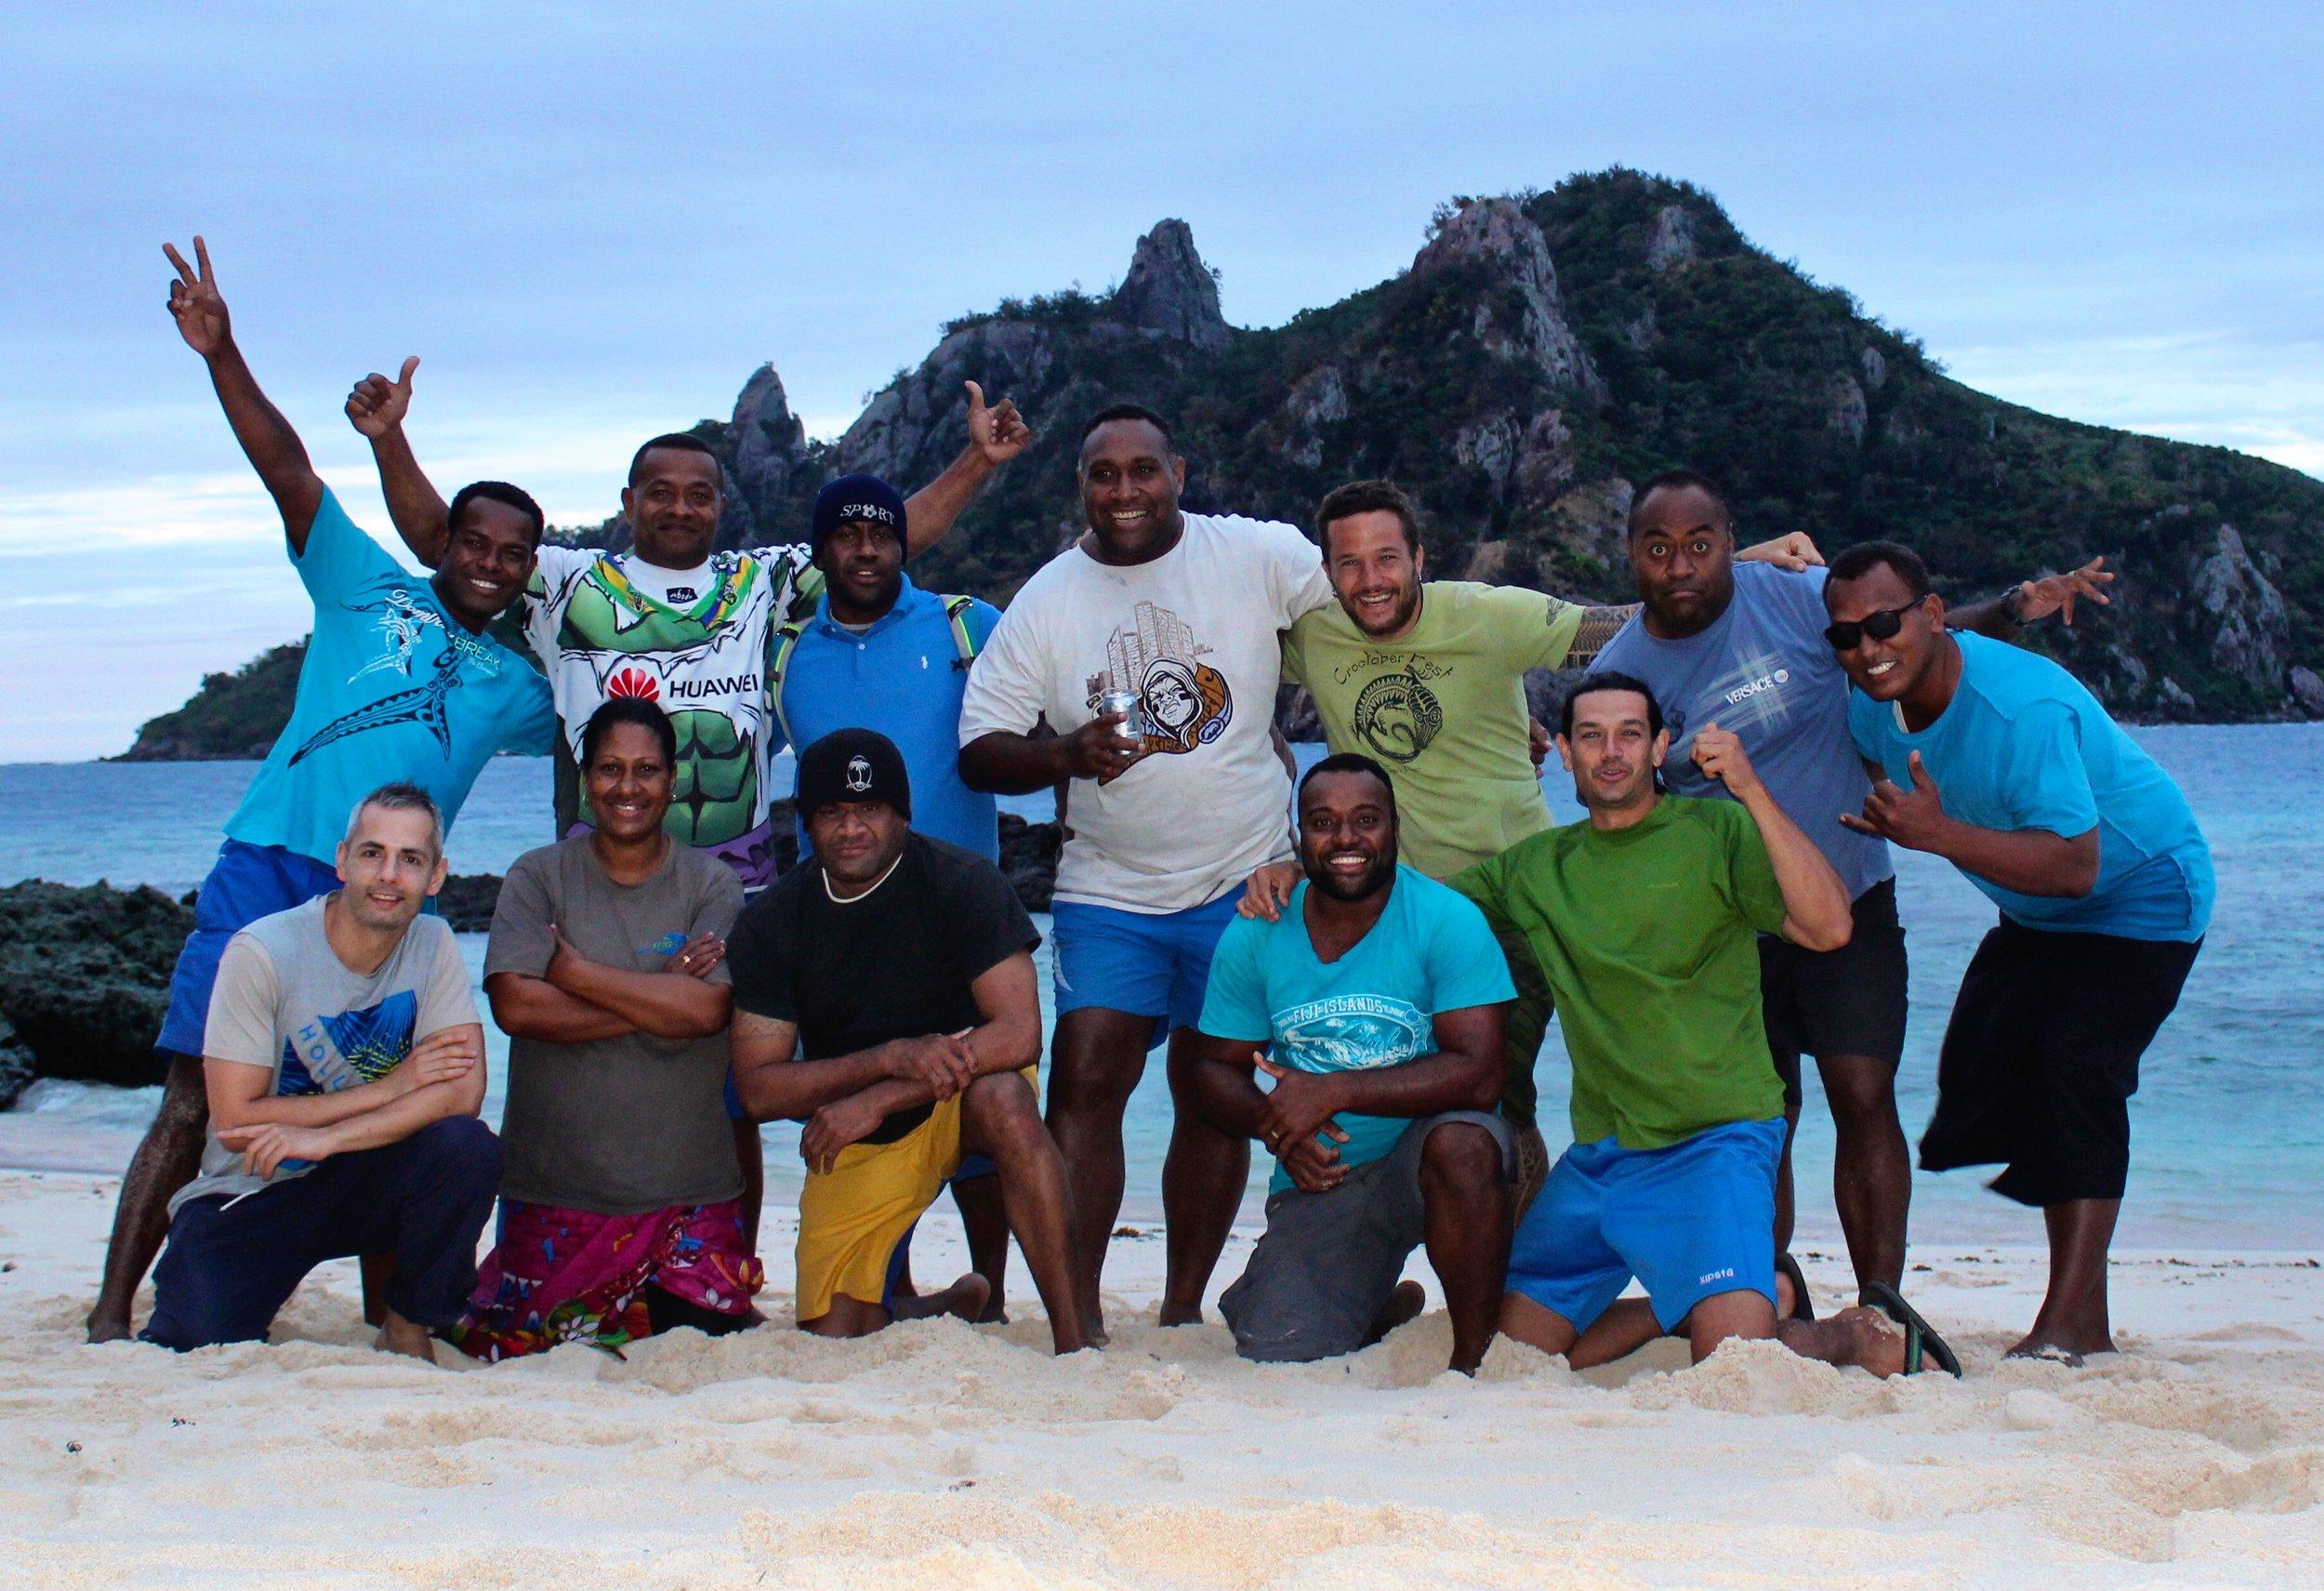 A nice team picture on Monuriki Island (Monu Island in background)